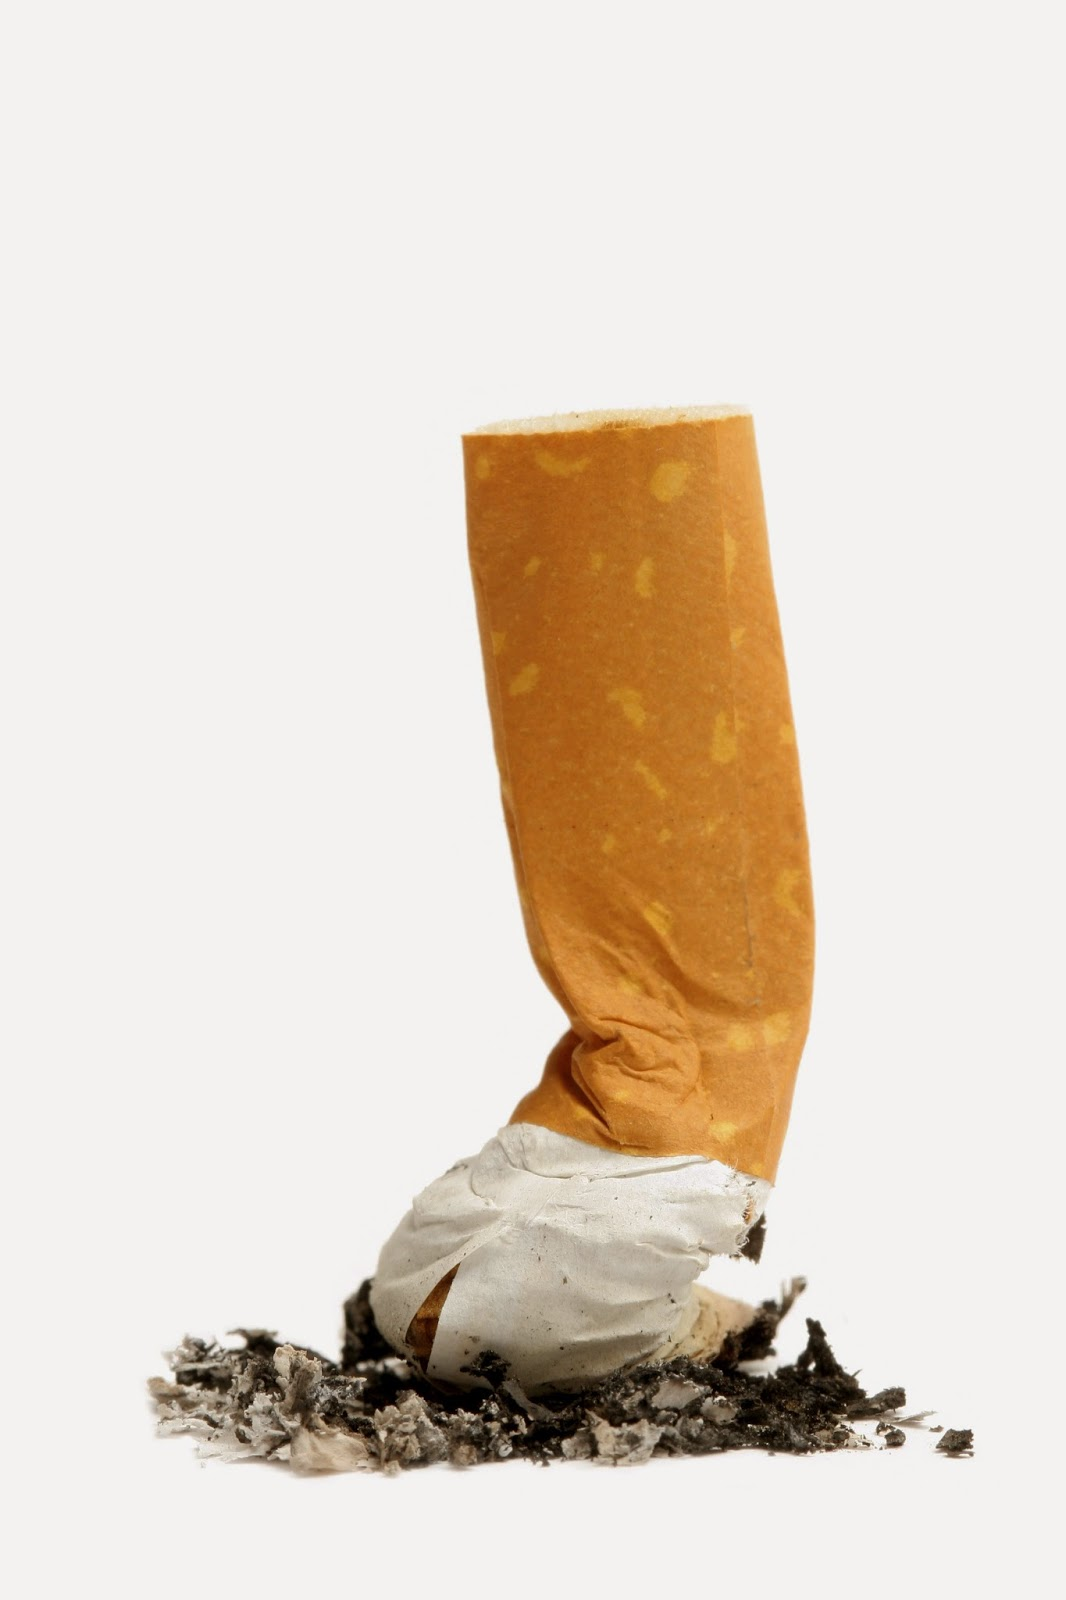 tak nak, stop smoking, berhenti merokok, tips berhenti merokok